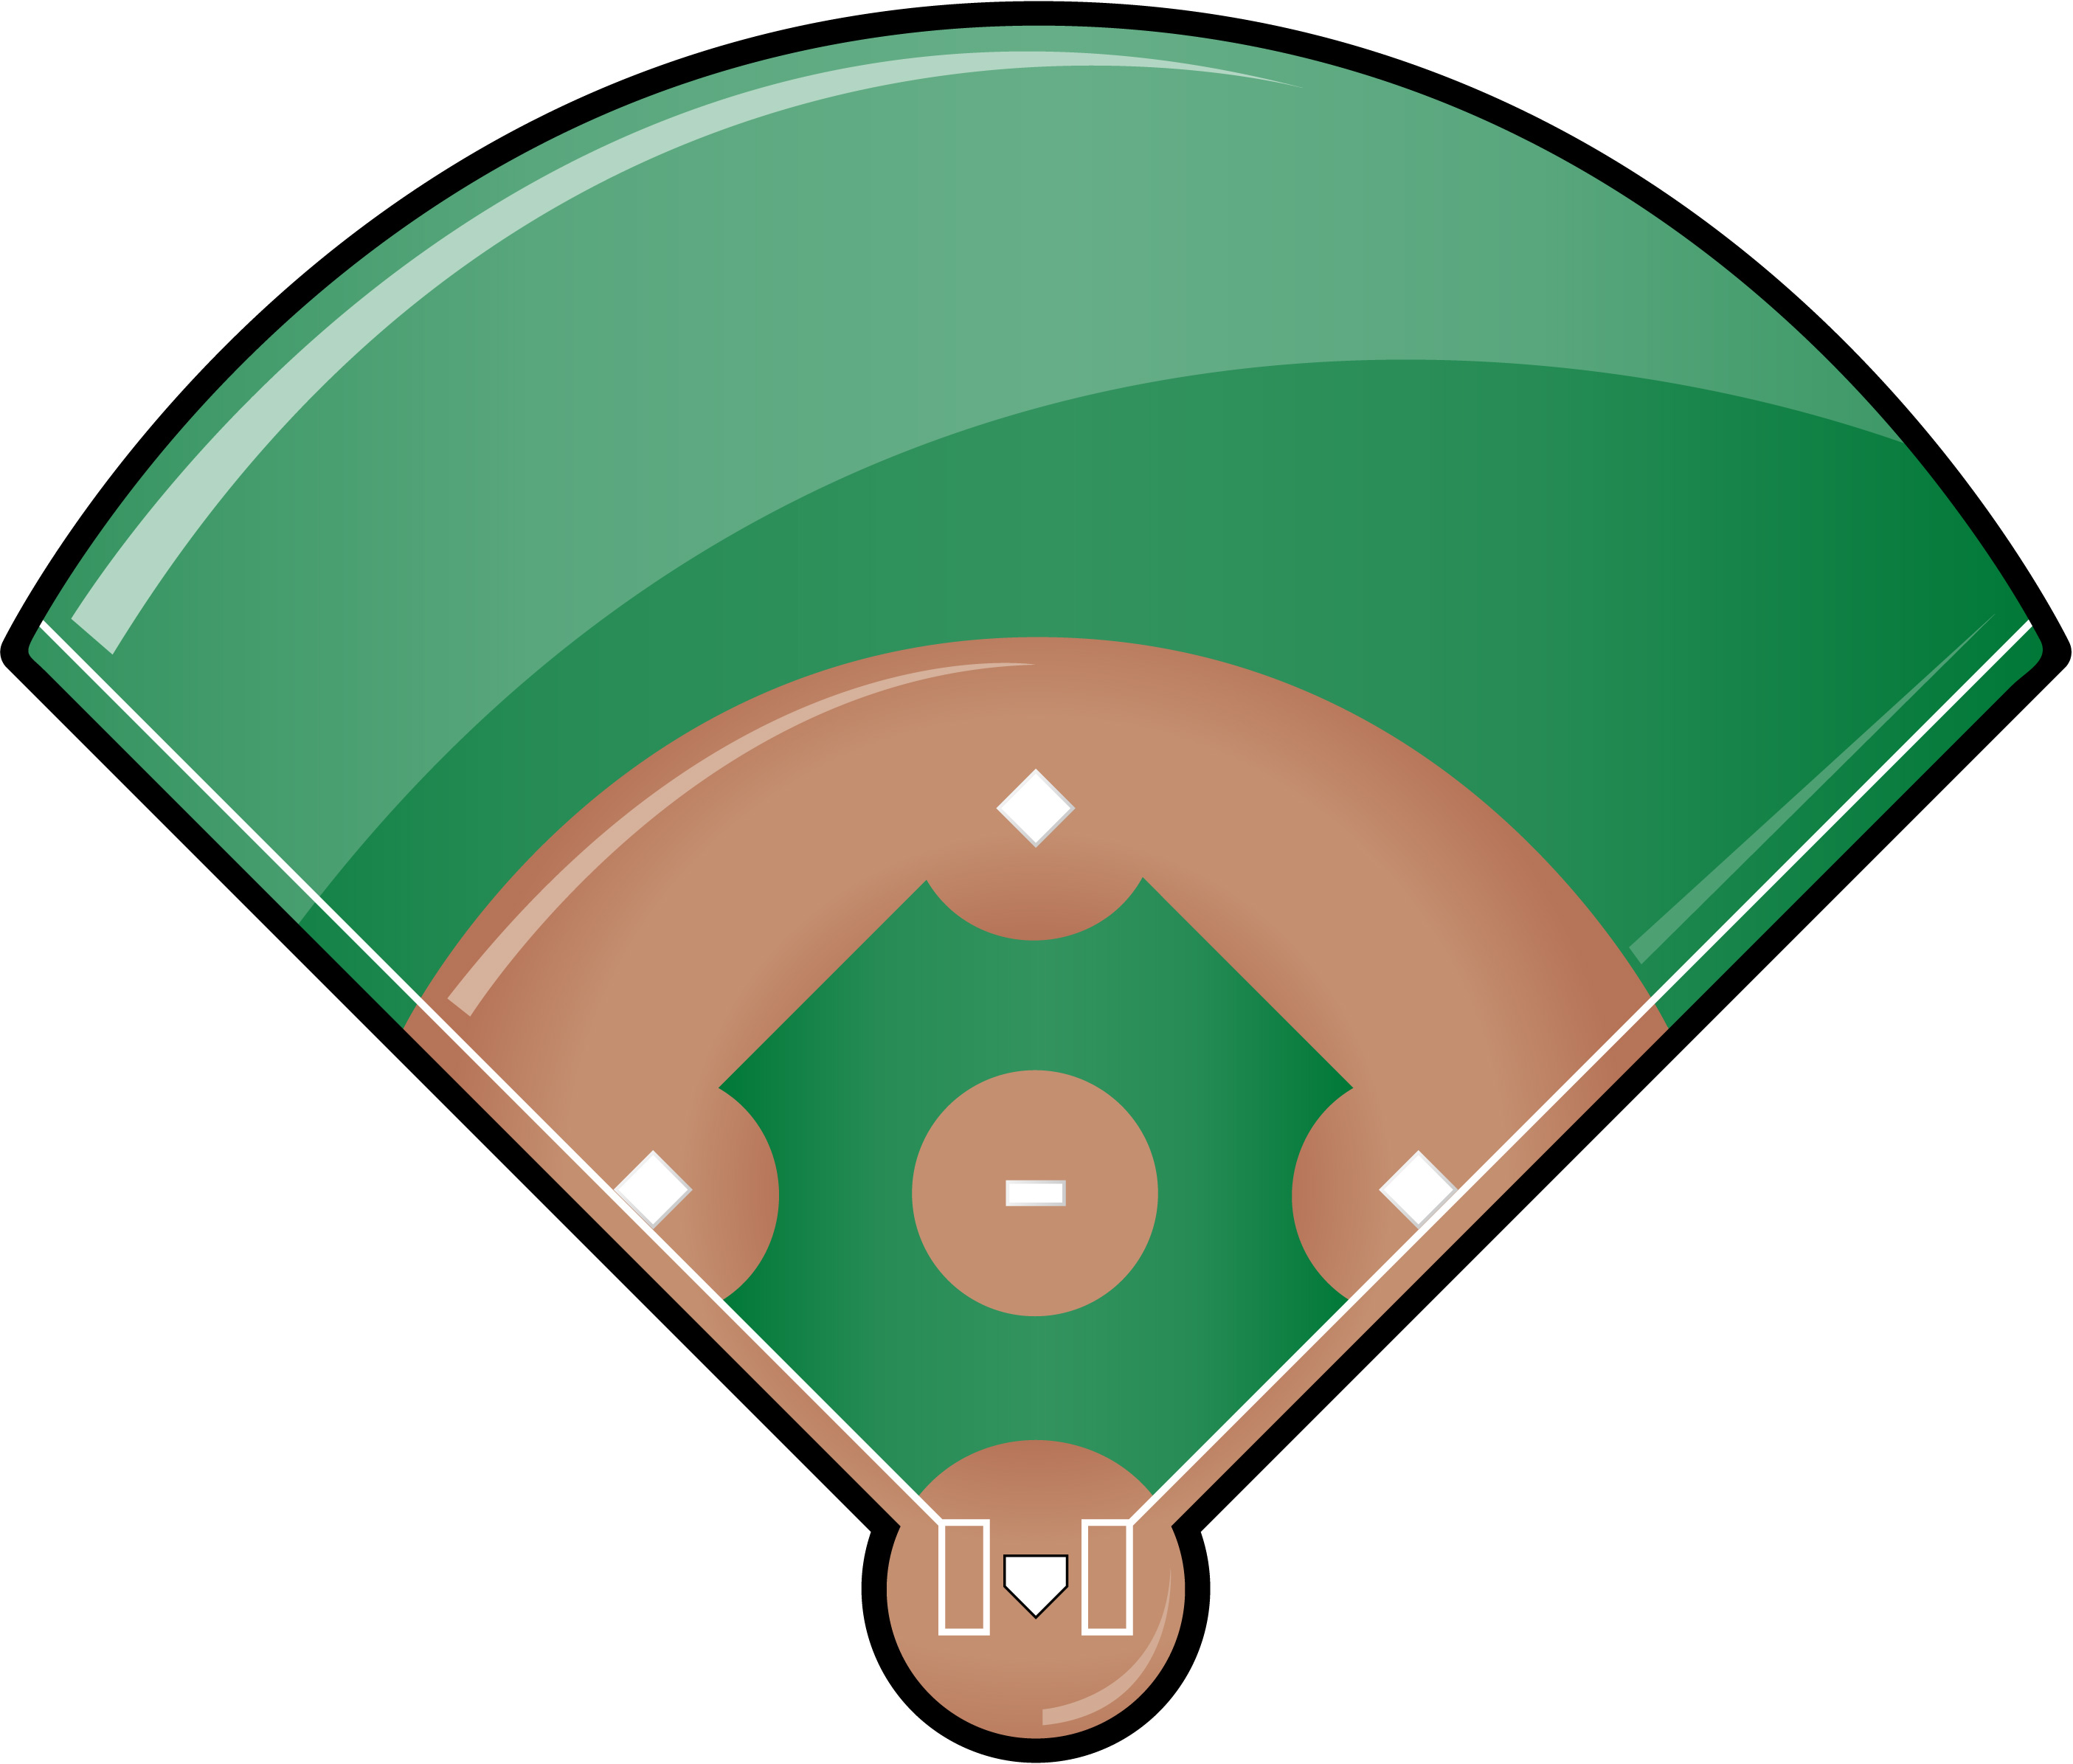 2810x2391 Stadium Clipart Baseball Stadium